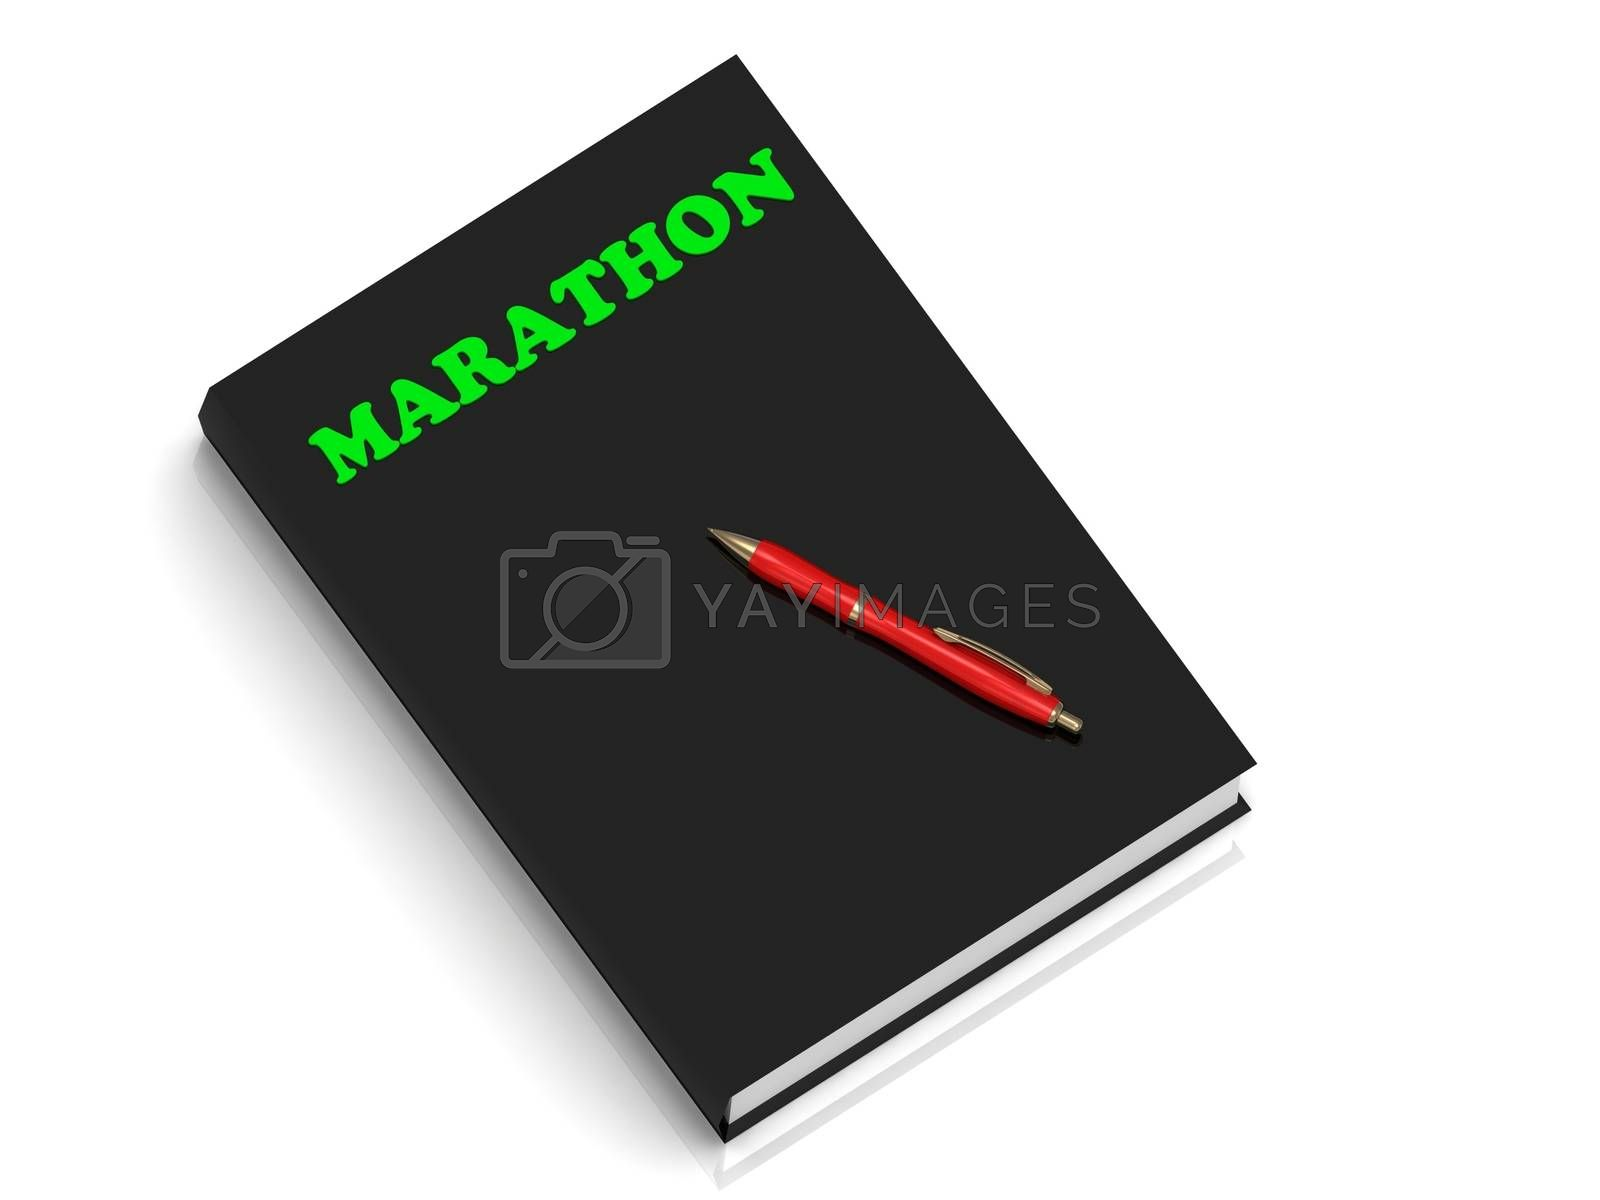 MARATHON- inscription of green letters on black book on white background